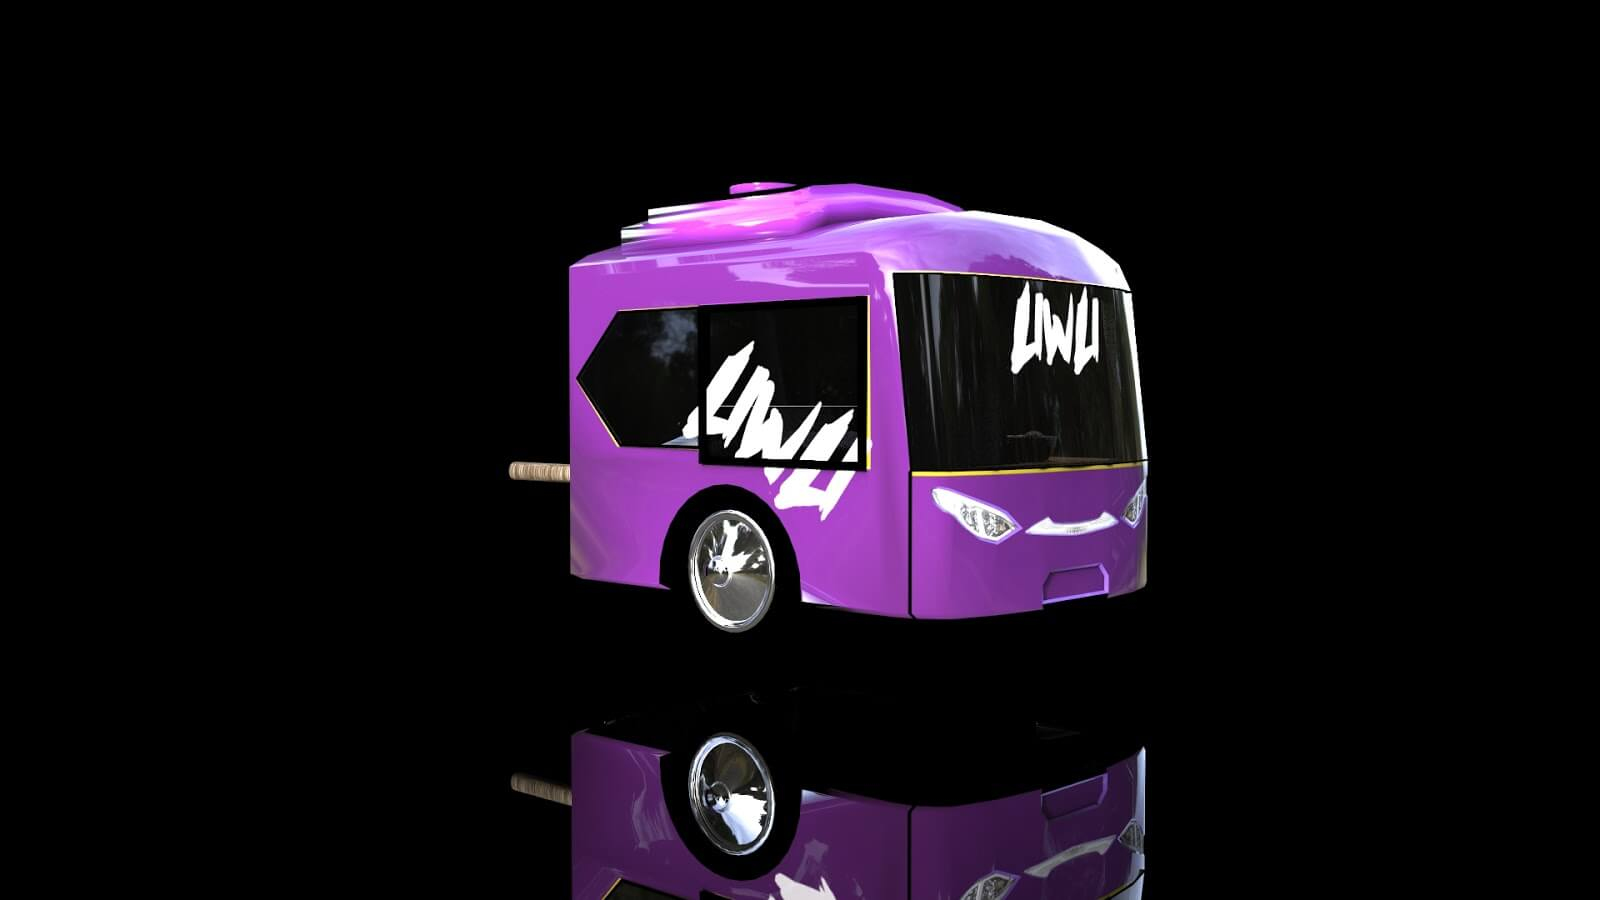 Download UMP UWU Mod for Bus Simulator Indonesia, UMP UWU, Bus Simulator Indonesia Mod, BUSSID mod, Mod BUSSID, Mod for BUSSID, New Bus Mod, SGCArena, UMP UWU, UMP UWU Mod for BUSSID, Vehicle Mod, Zilla